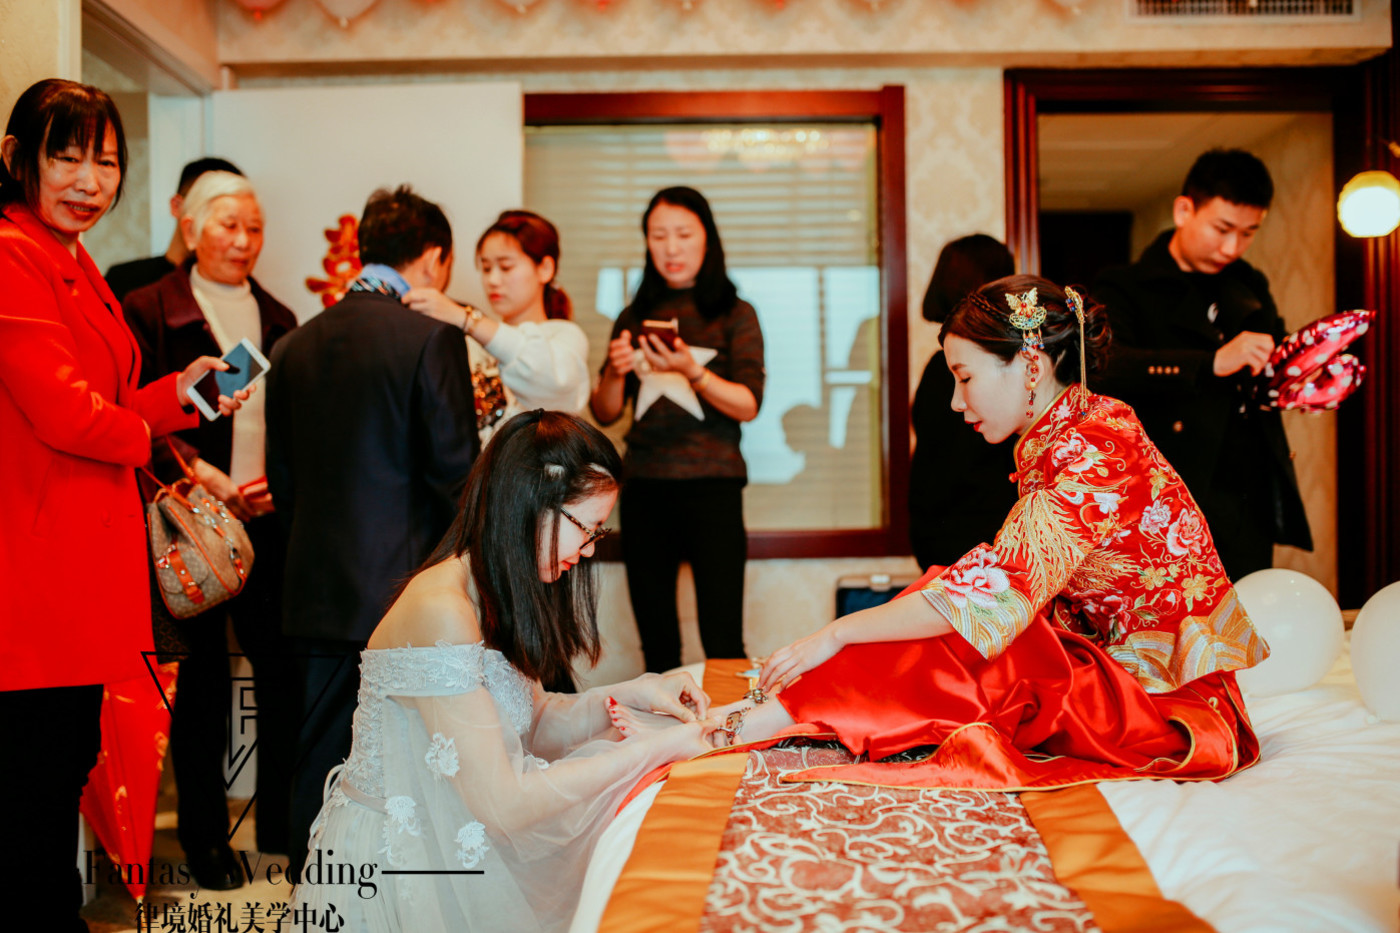 「Fantasy Wedding」& A/P 南艳湖9